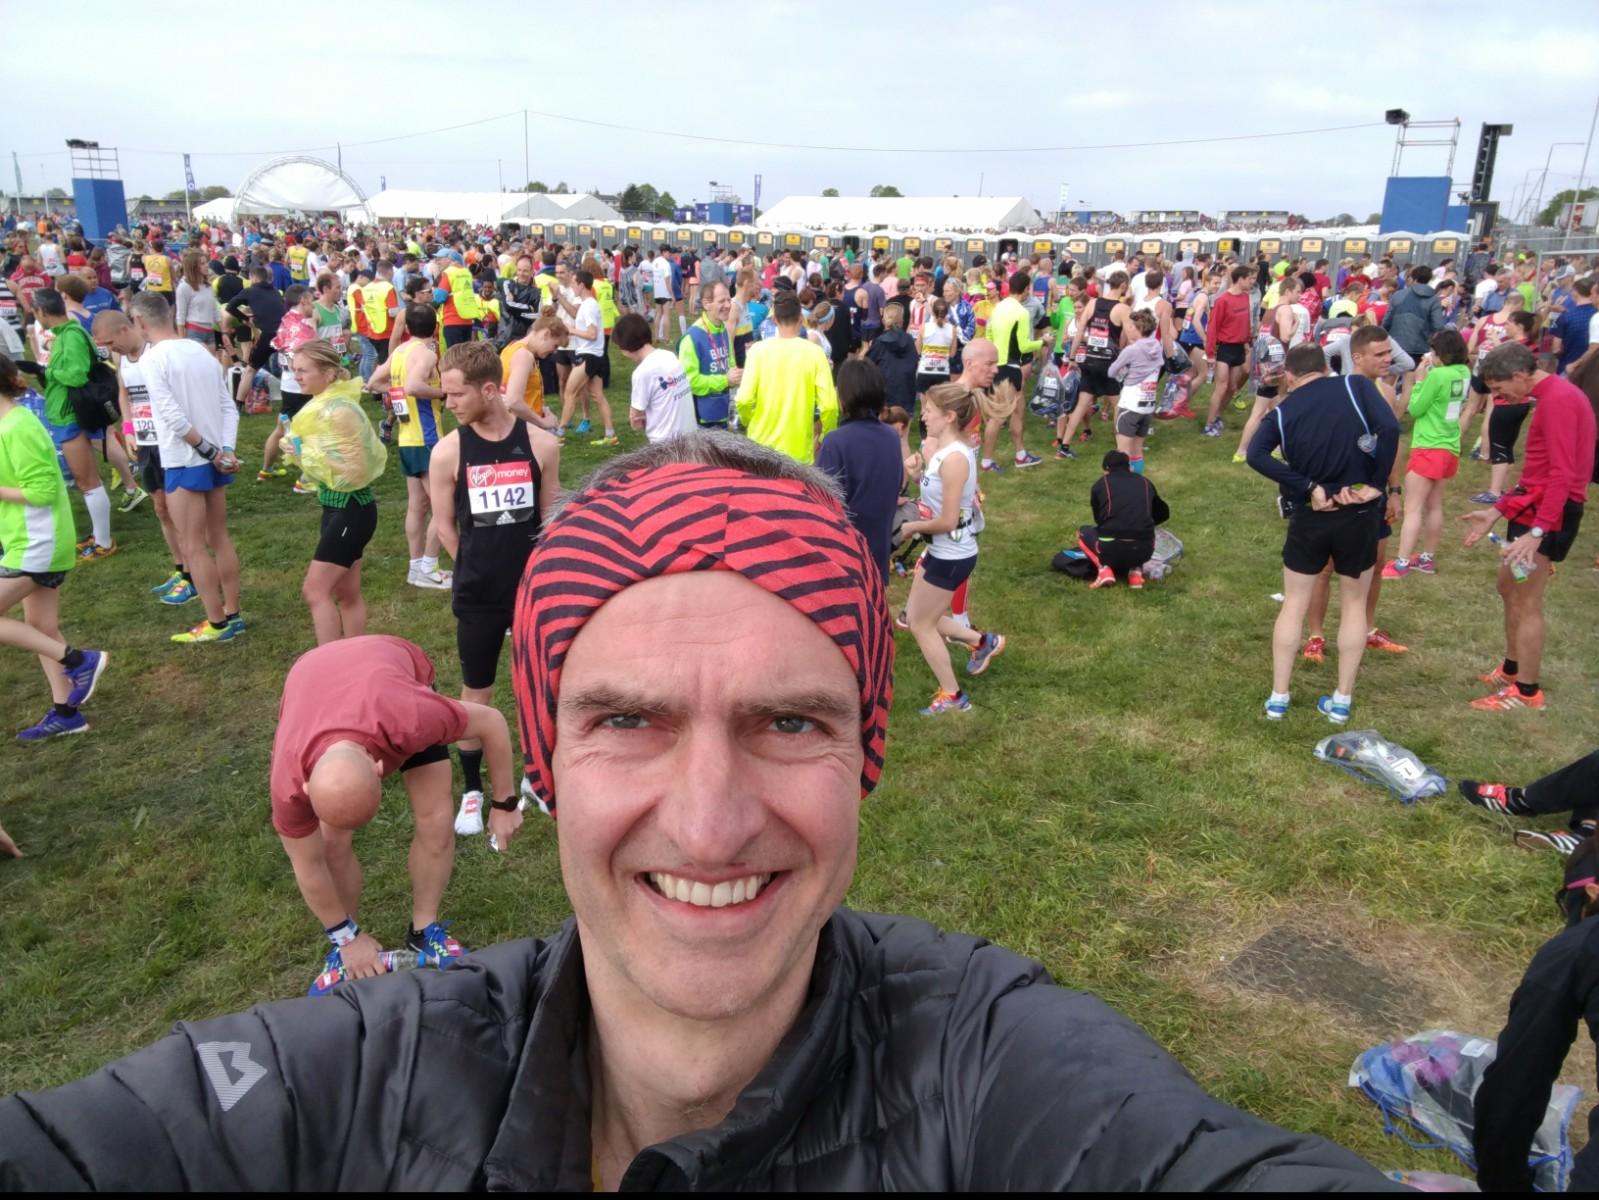 champs start london 2017 marathon david sawyer